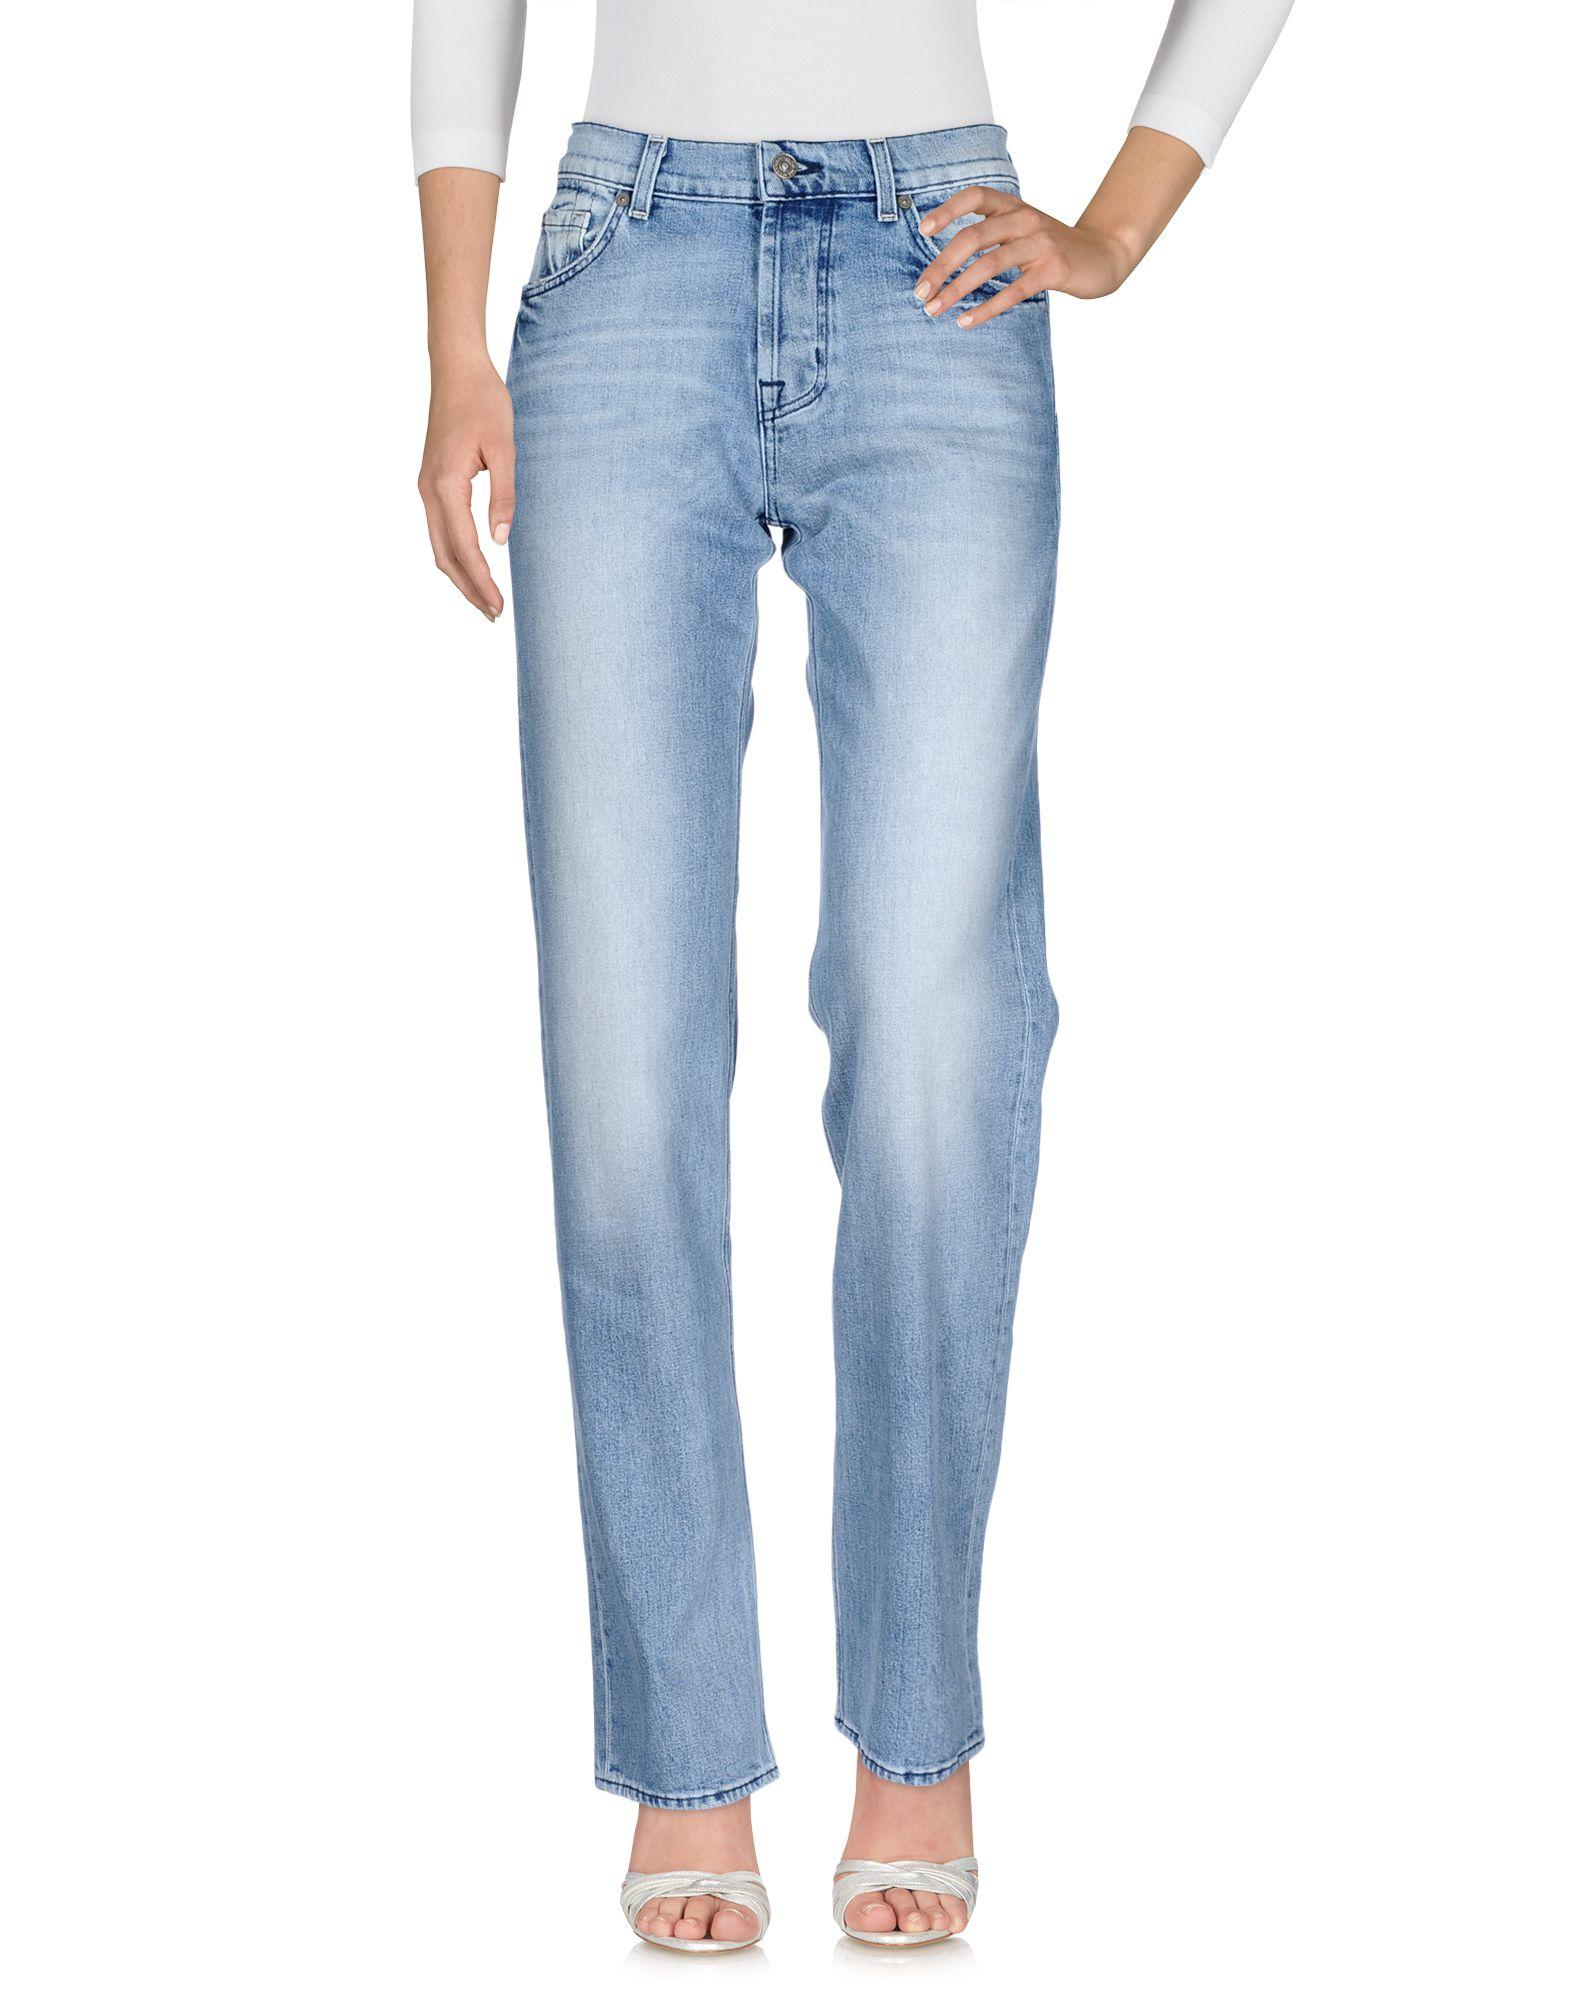 Pantaloni Jeans 7 For All Mankind Donna - Acquista online su pxwltoAji5